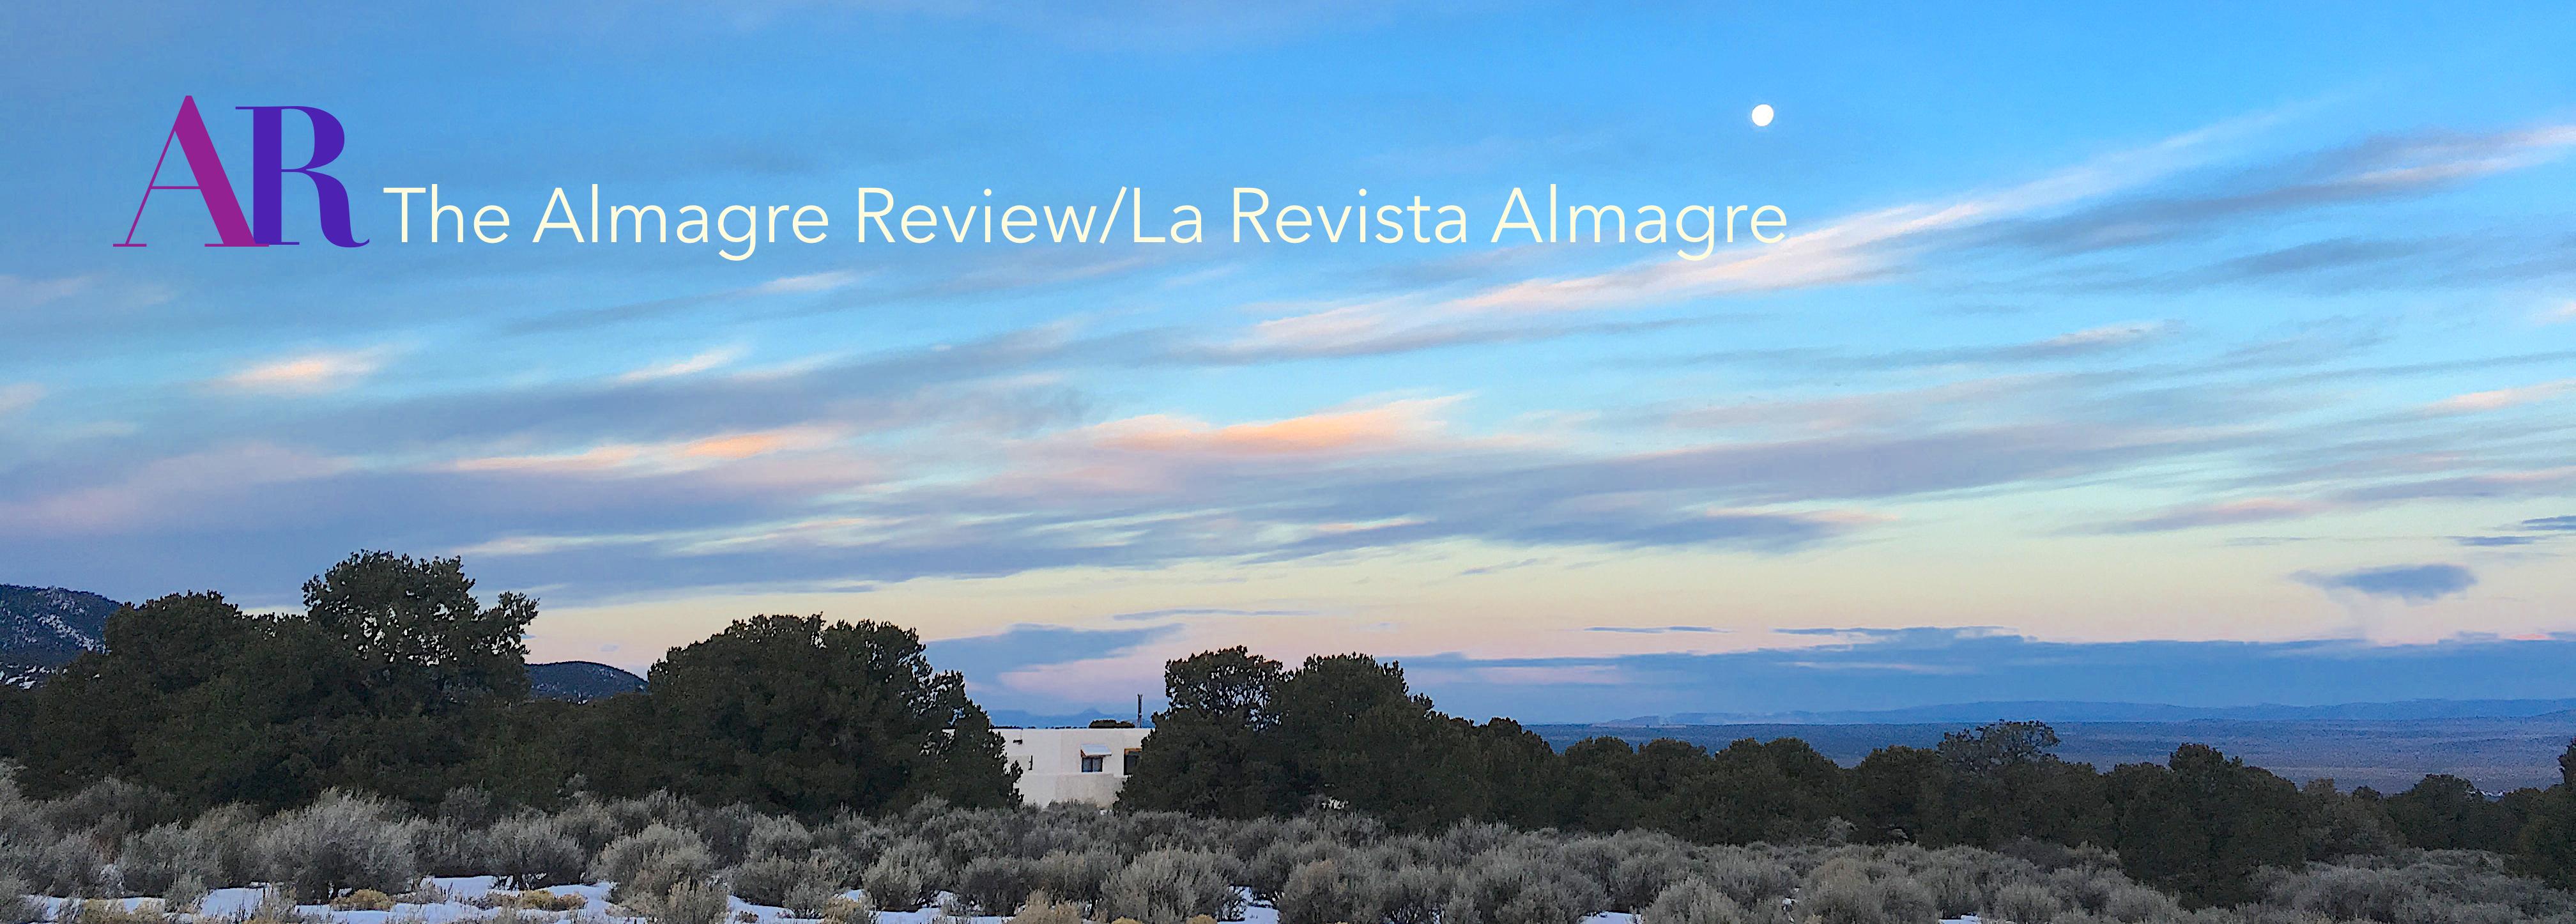 FB Banner (Almagre Review)